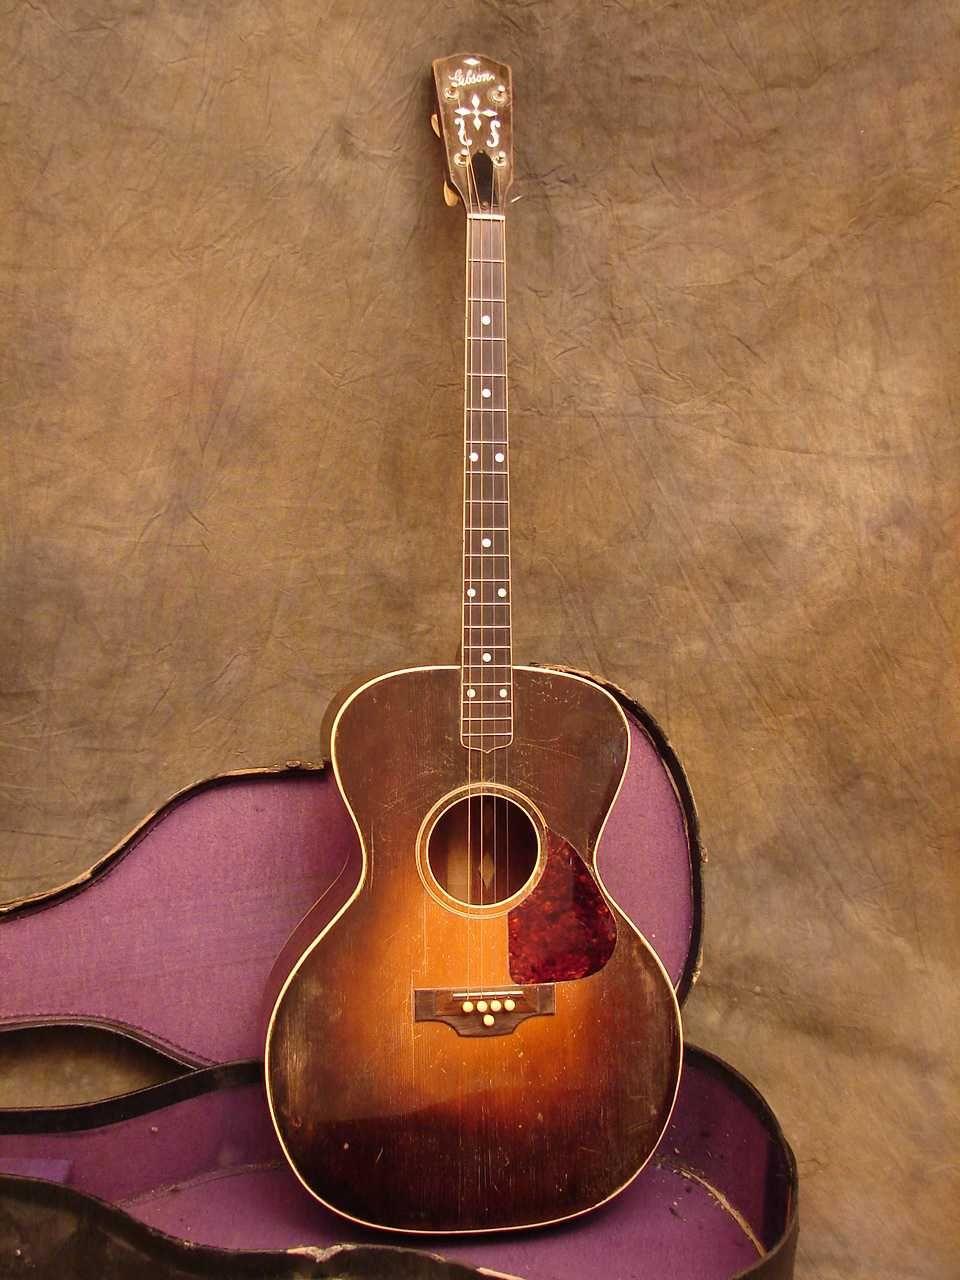 1929 Gibson Tg 1 Tenor Acoustic Guitar Guitar Acoustic Guitar Music Vintage Guitars